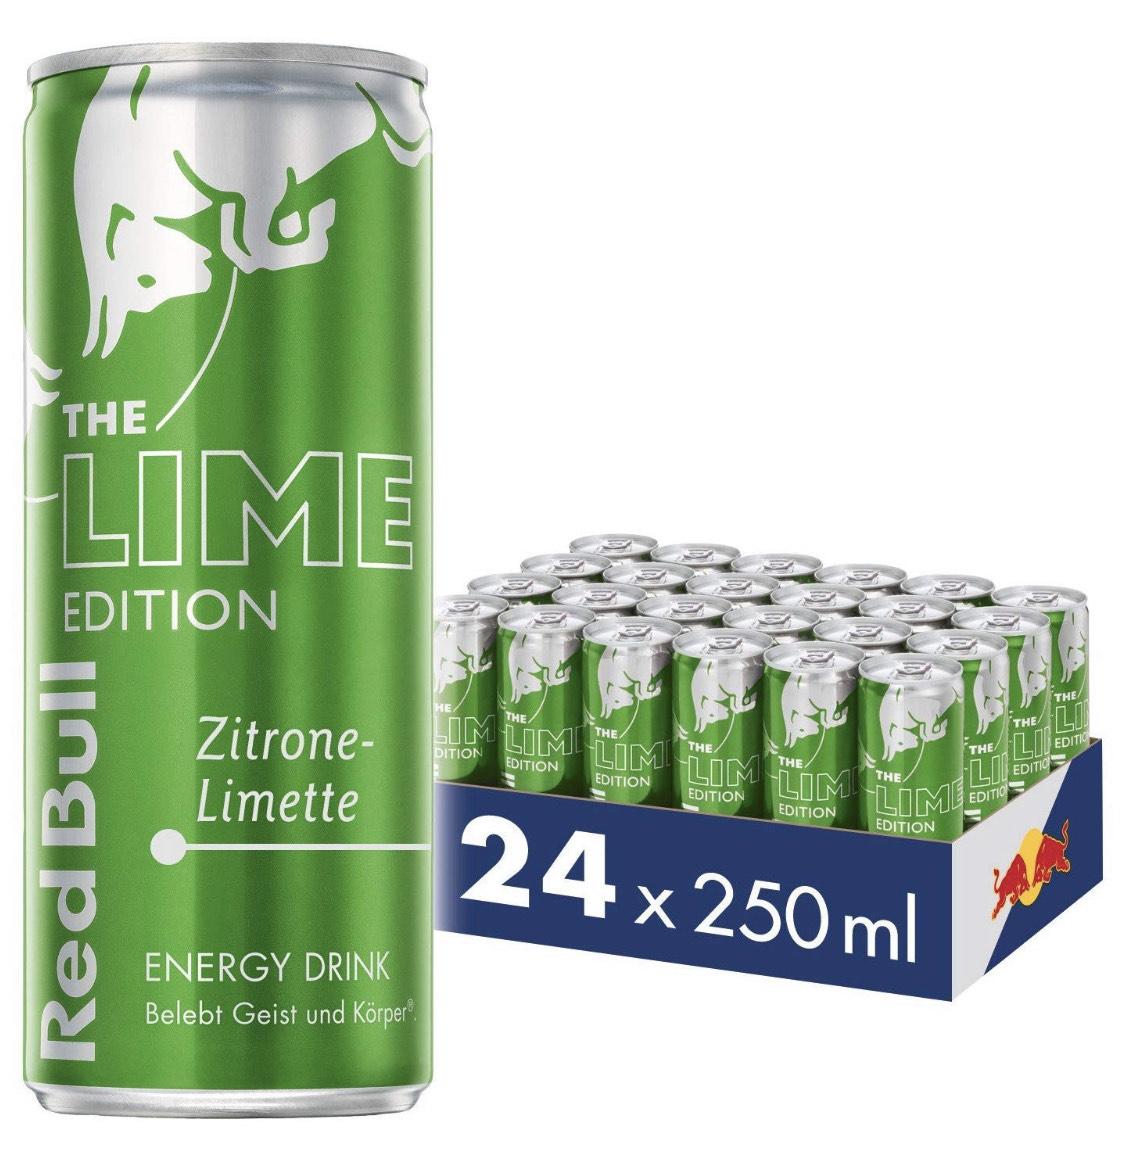 [Amazon] Red Bull Energy Drink Zitrone Limette 24 x 250 ml OHNE Pfand